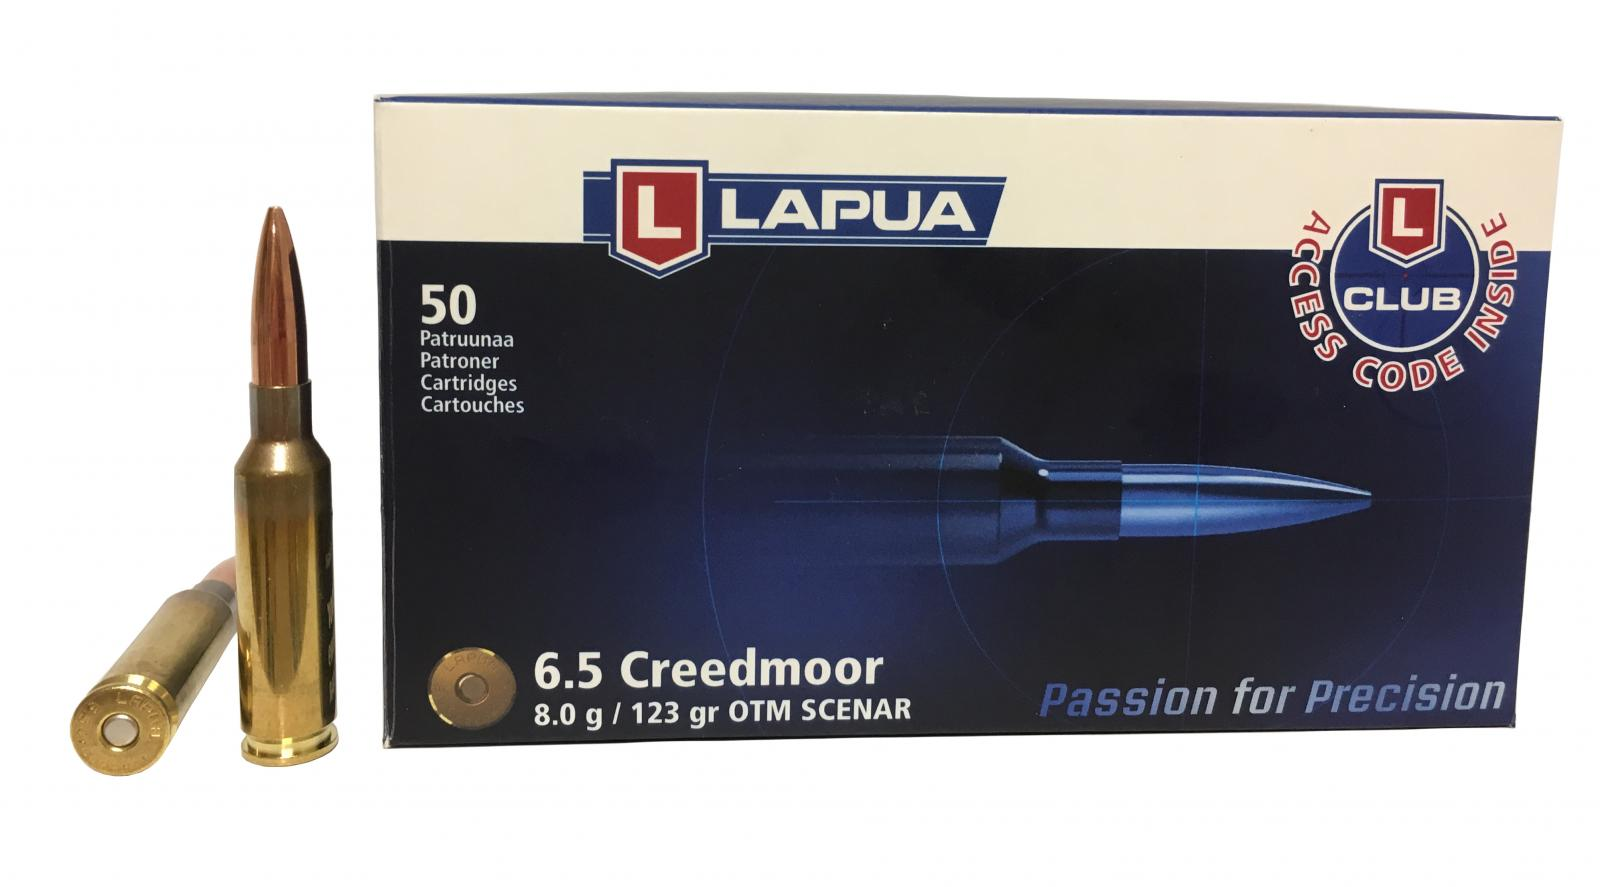 Boite de 50 Cartouches 6.5 Creedmore LAPUA  123 grs SCENAR